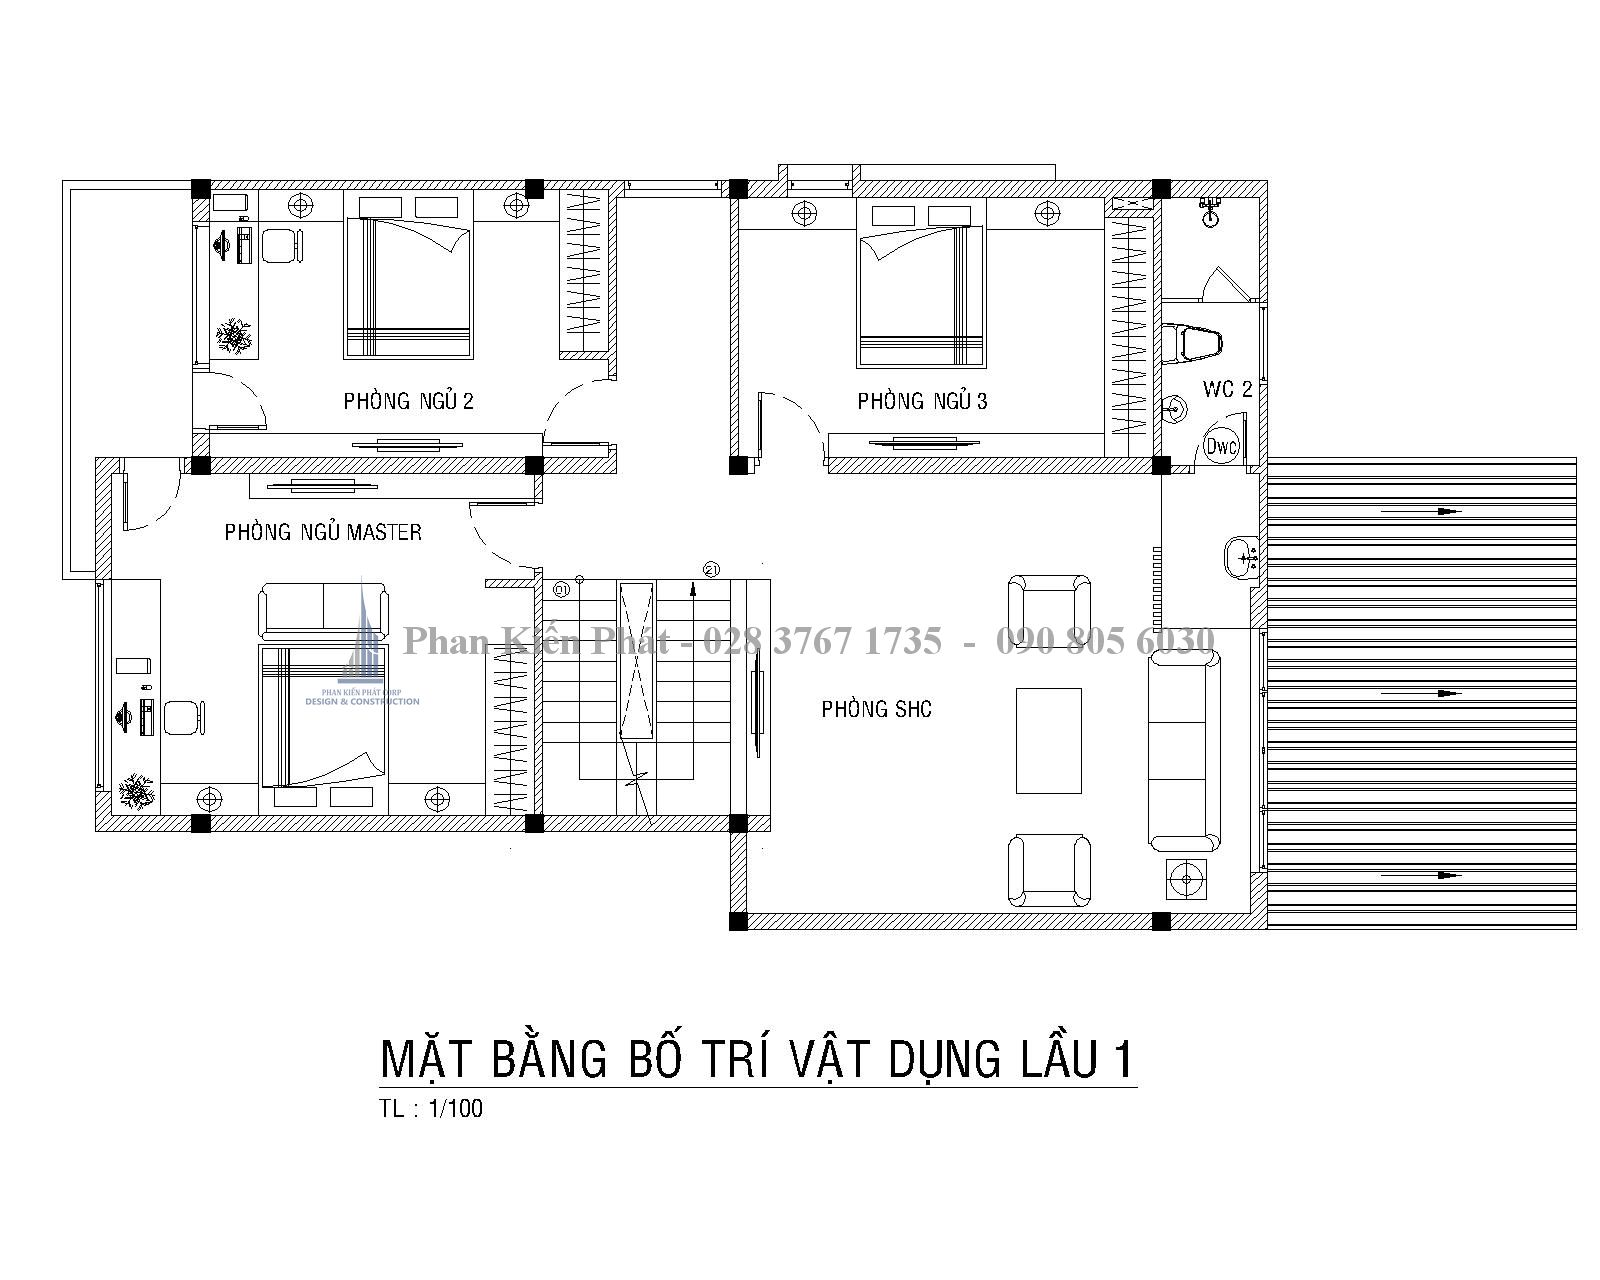 Mat Bang Bo Tri Vat Dung Lau 1 Biet Thu Vuon